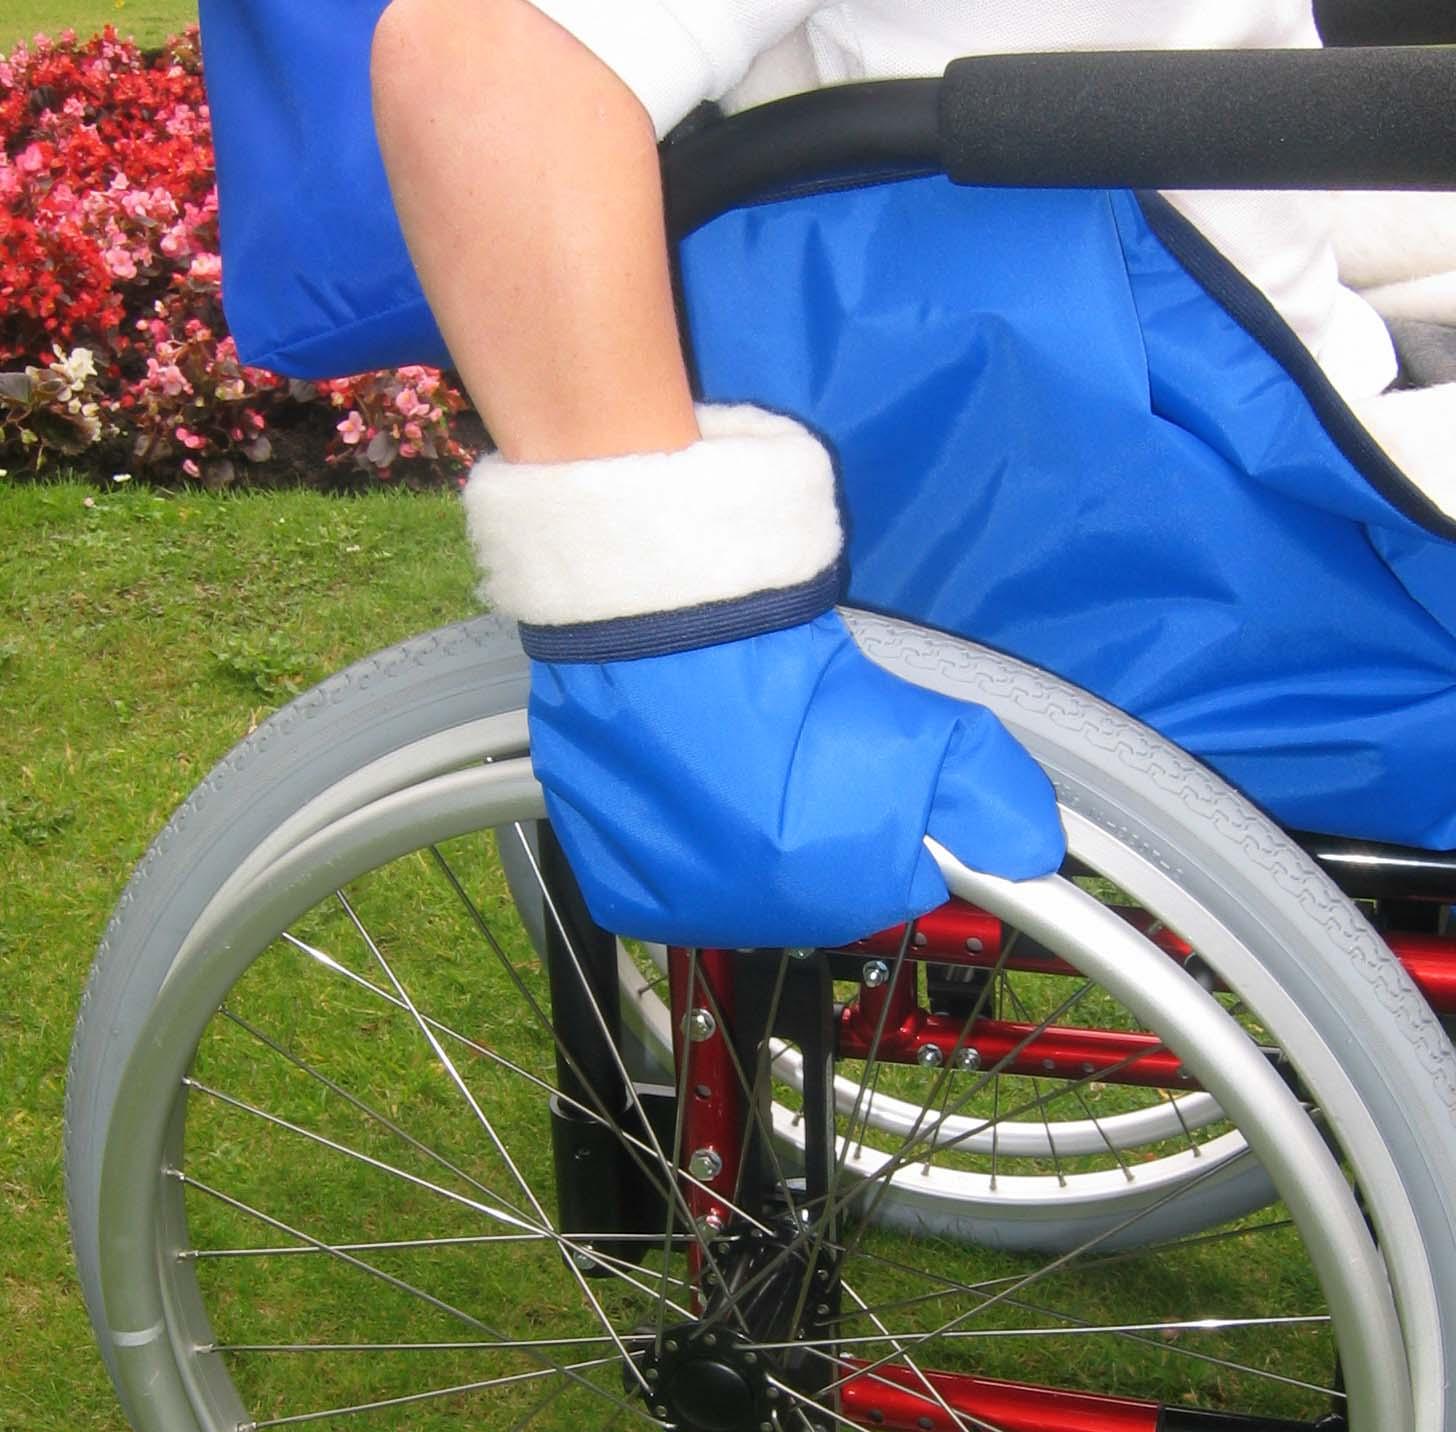 Guantes ni o para silla de ruedas - Silla de ruedas ninos ...